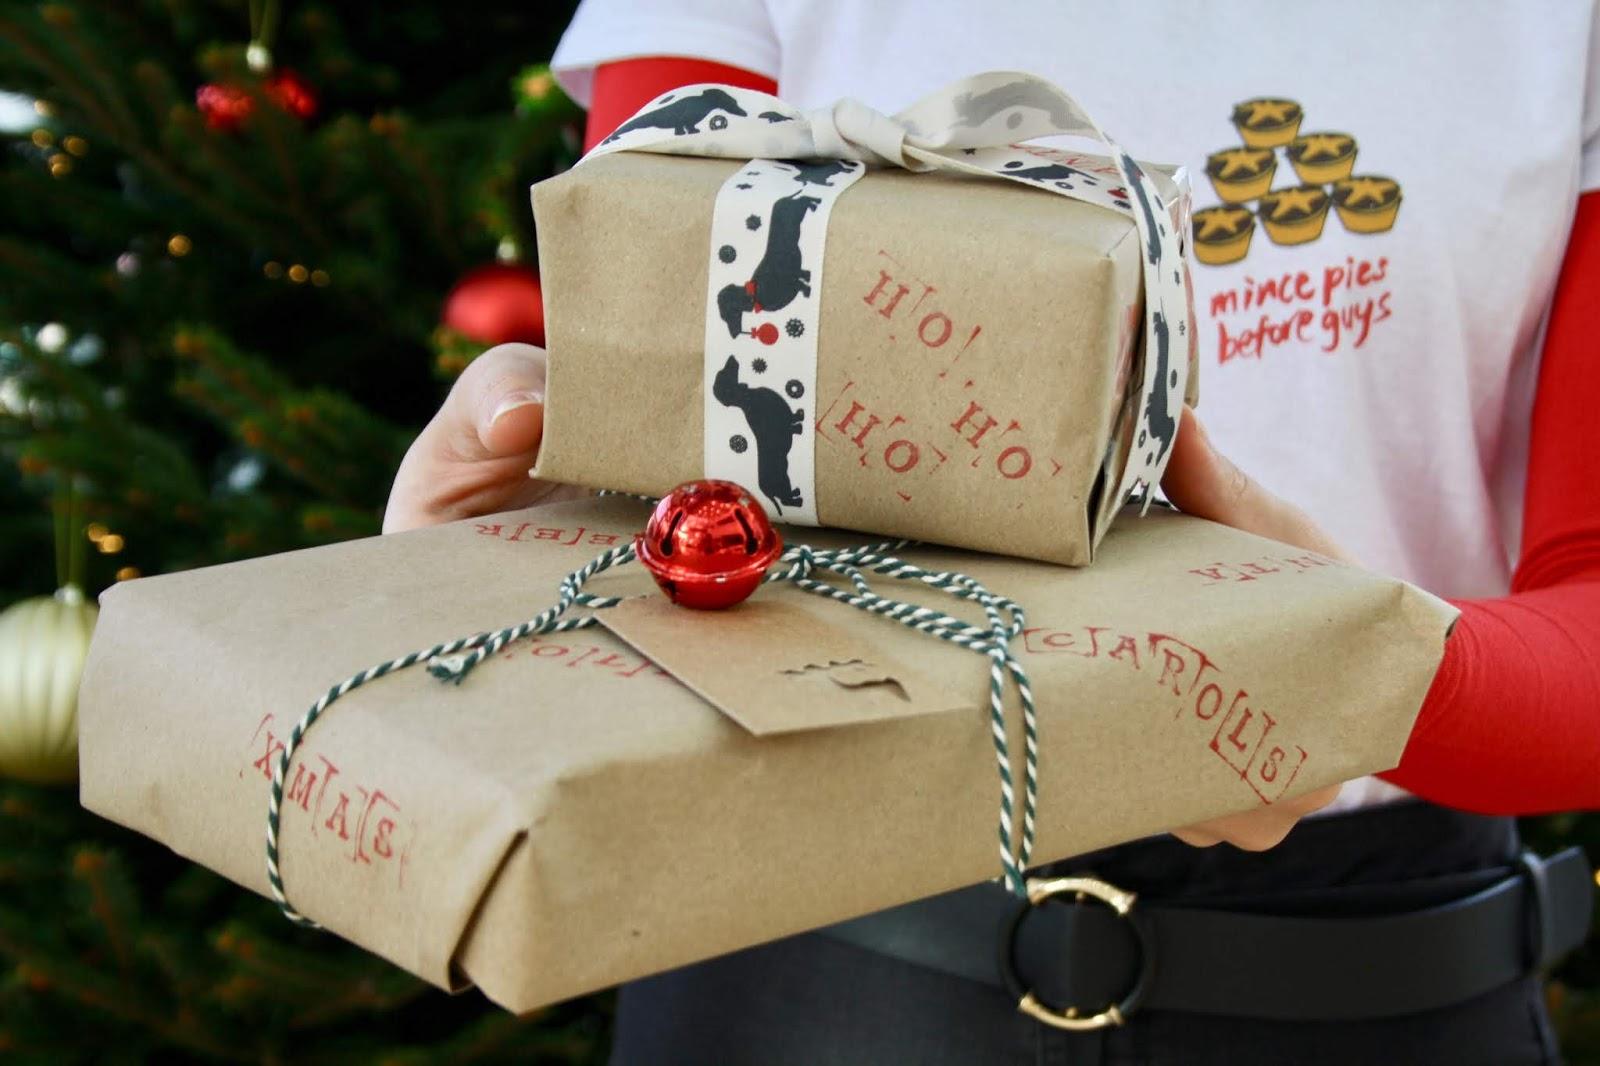 Christmas shopping presents festive buy shop